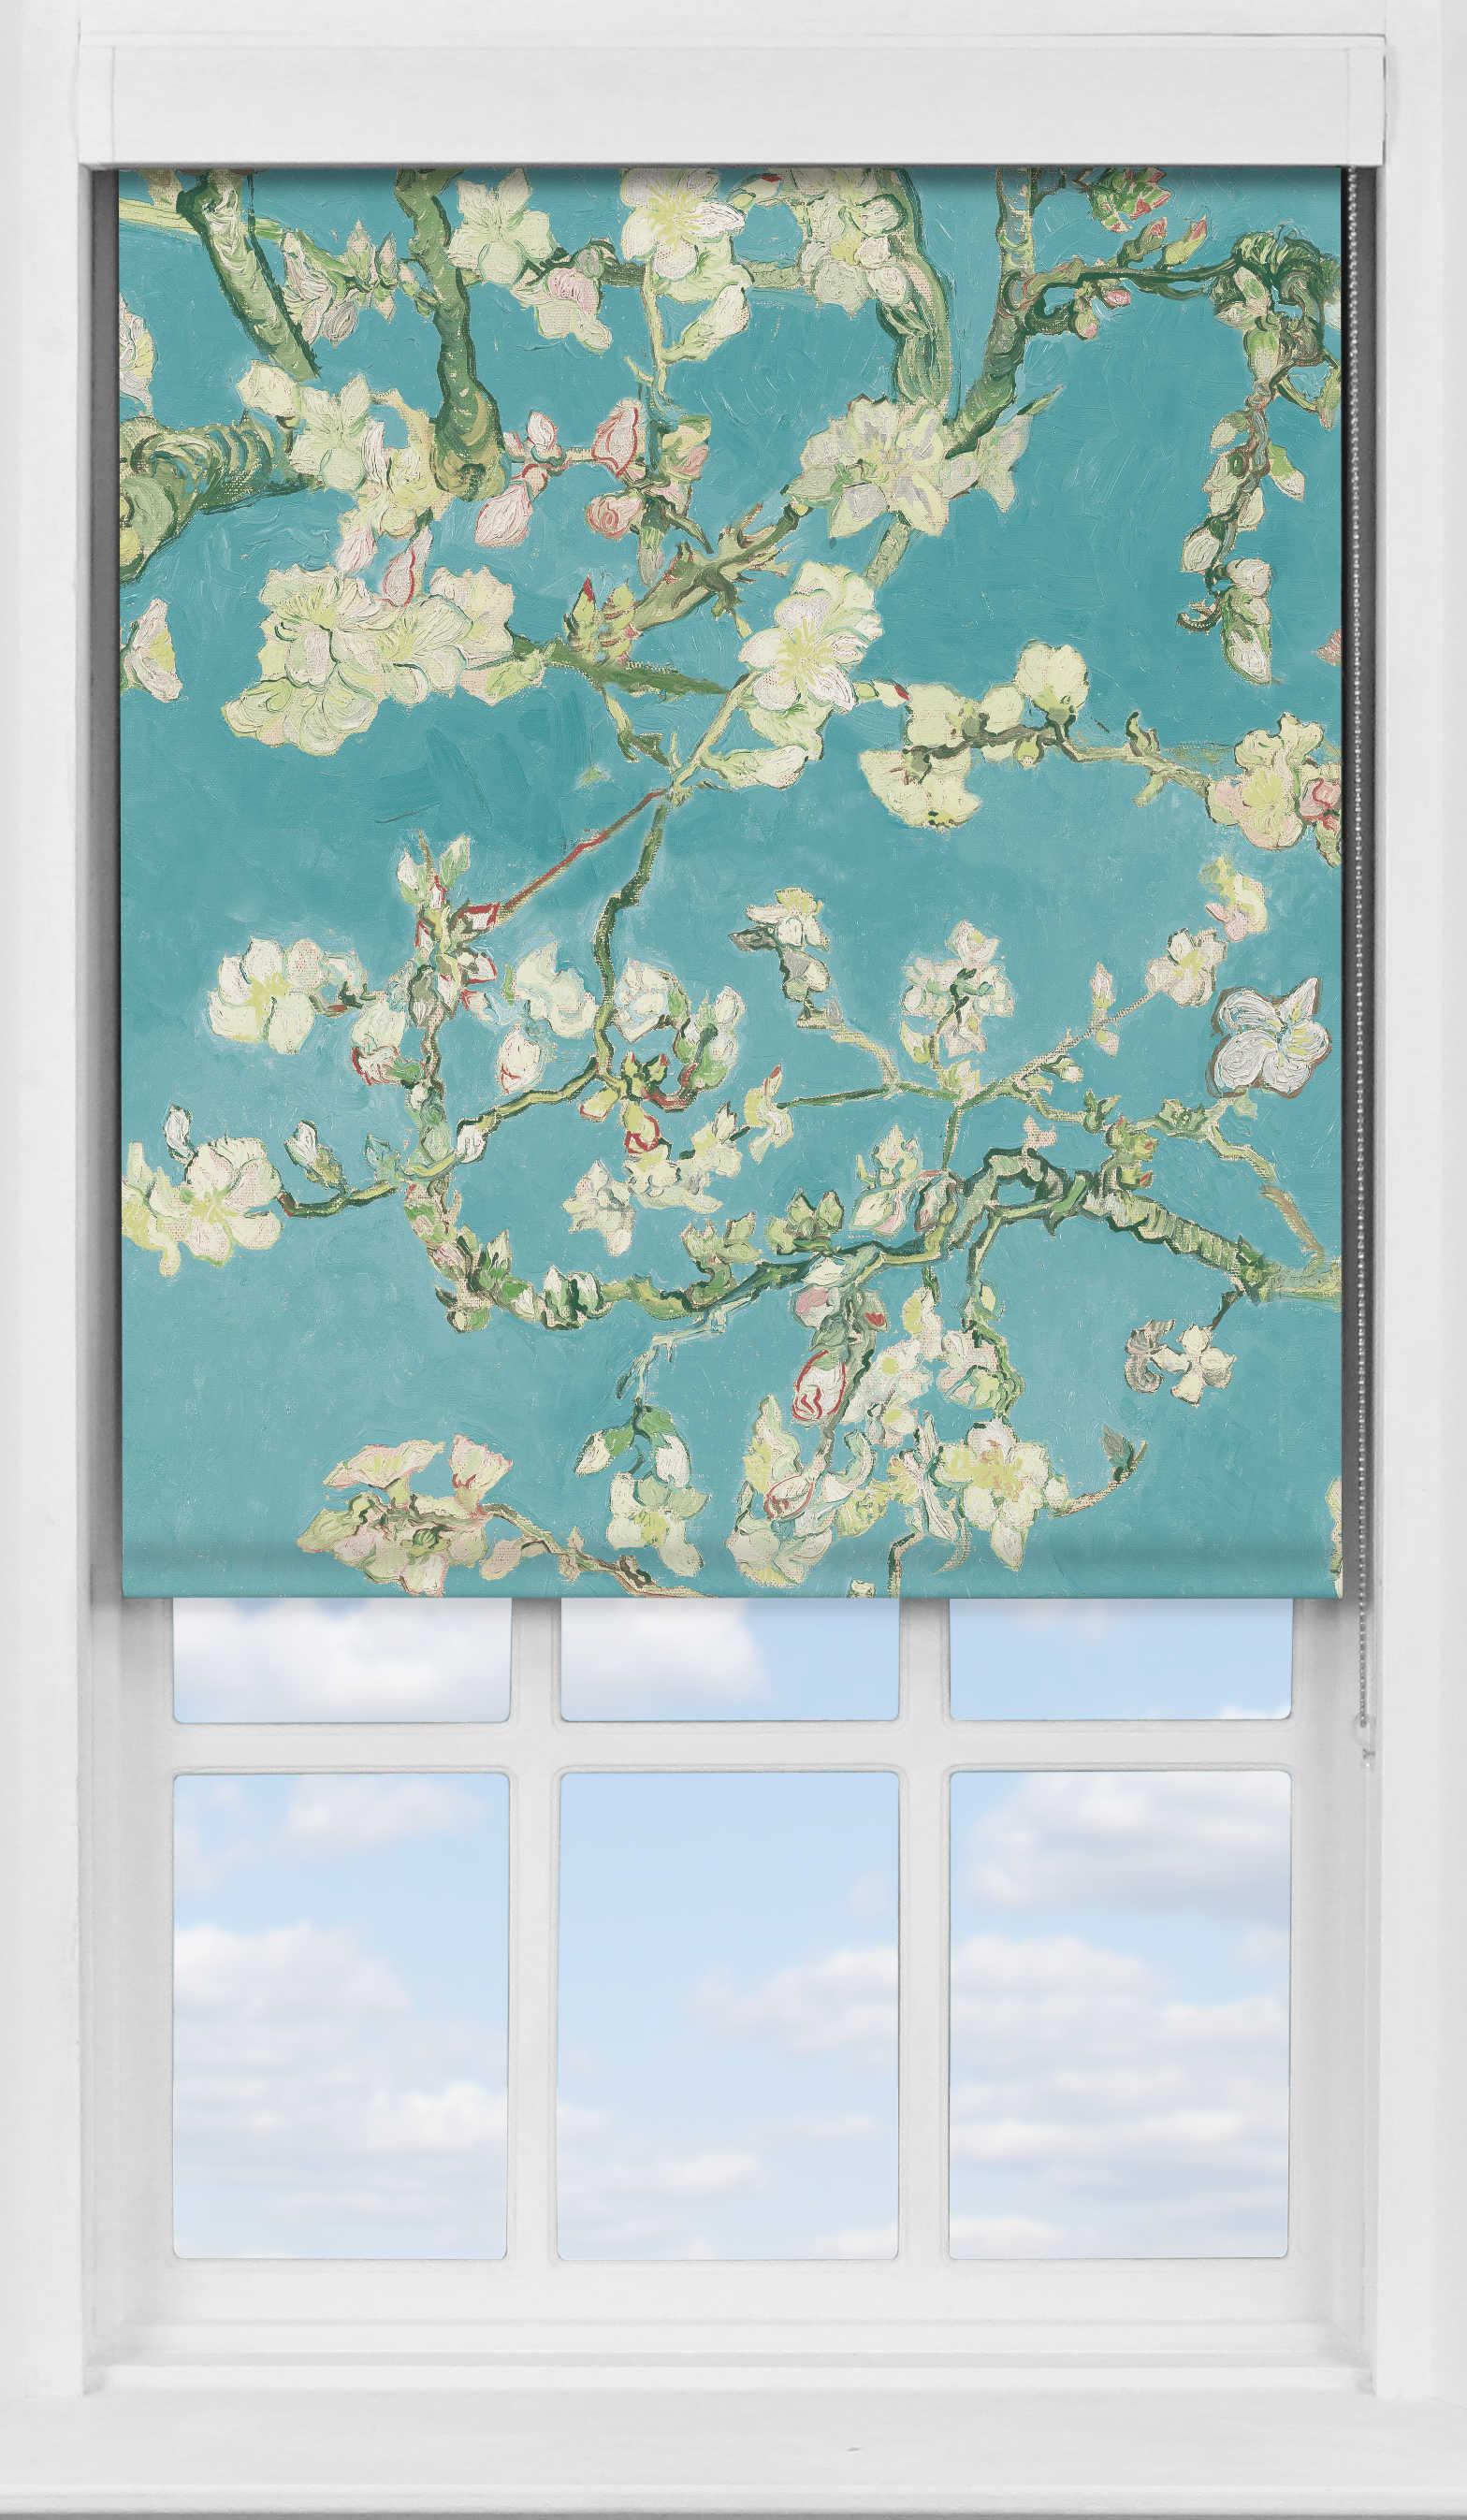 Premium Roller Blind in Van Gogh Almond Blossom Blue Translucent